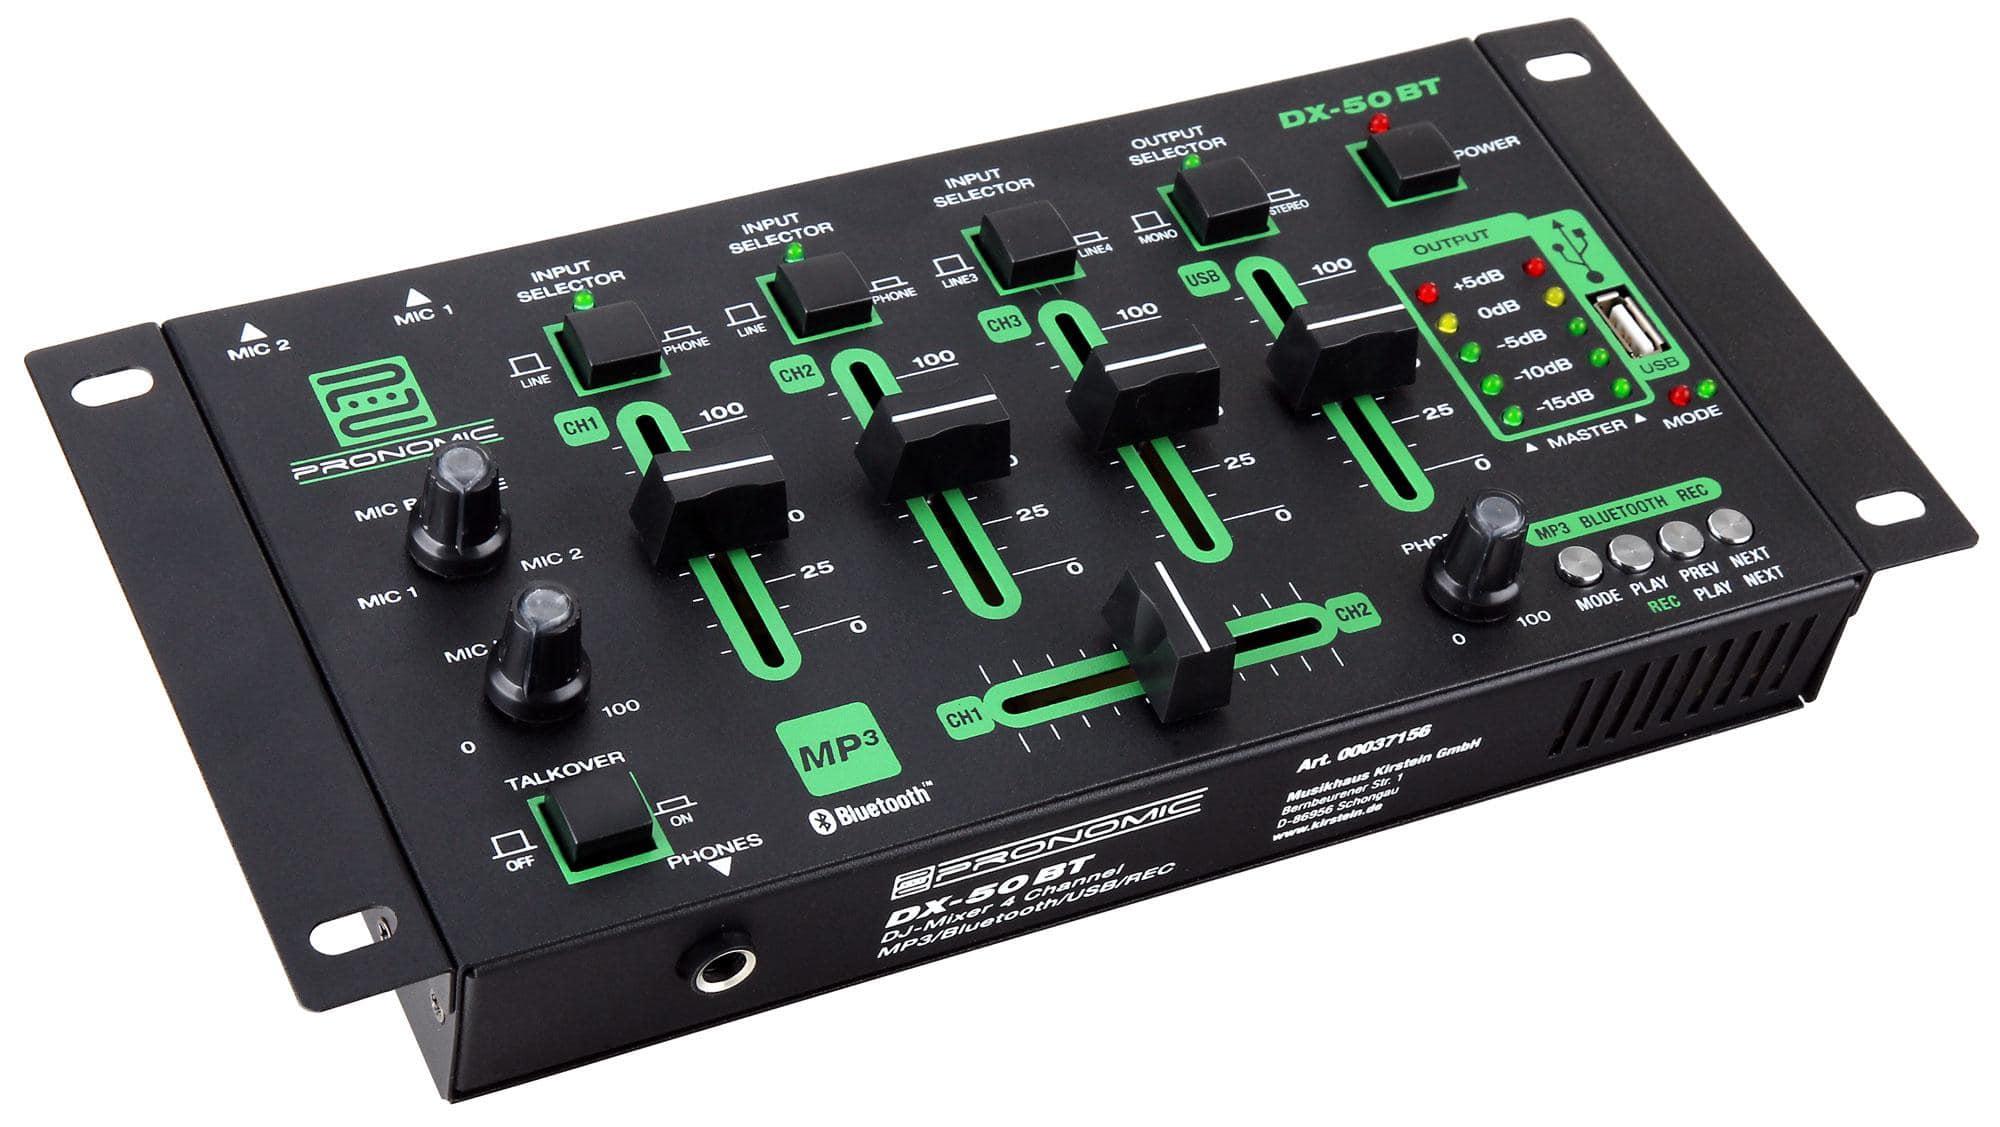 Pronomic DX 50 4 Kanal USB DJ Mixer mit Recording Funktion und Bluetooth